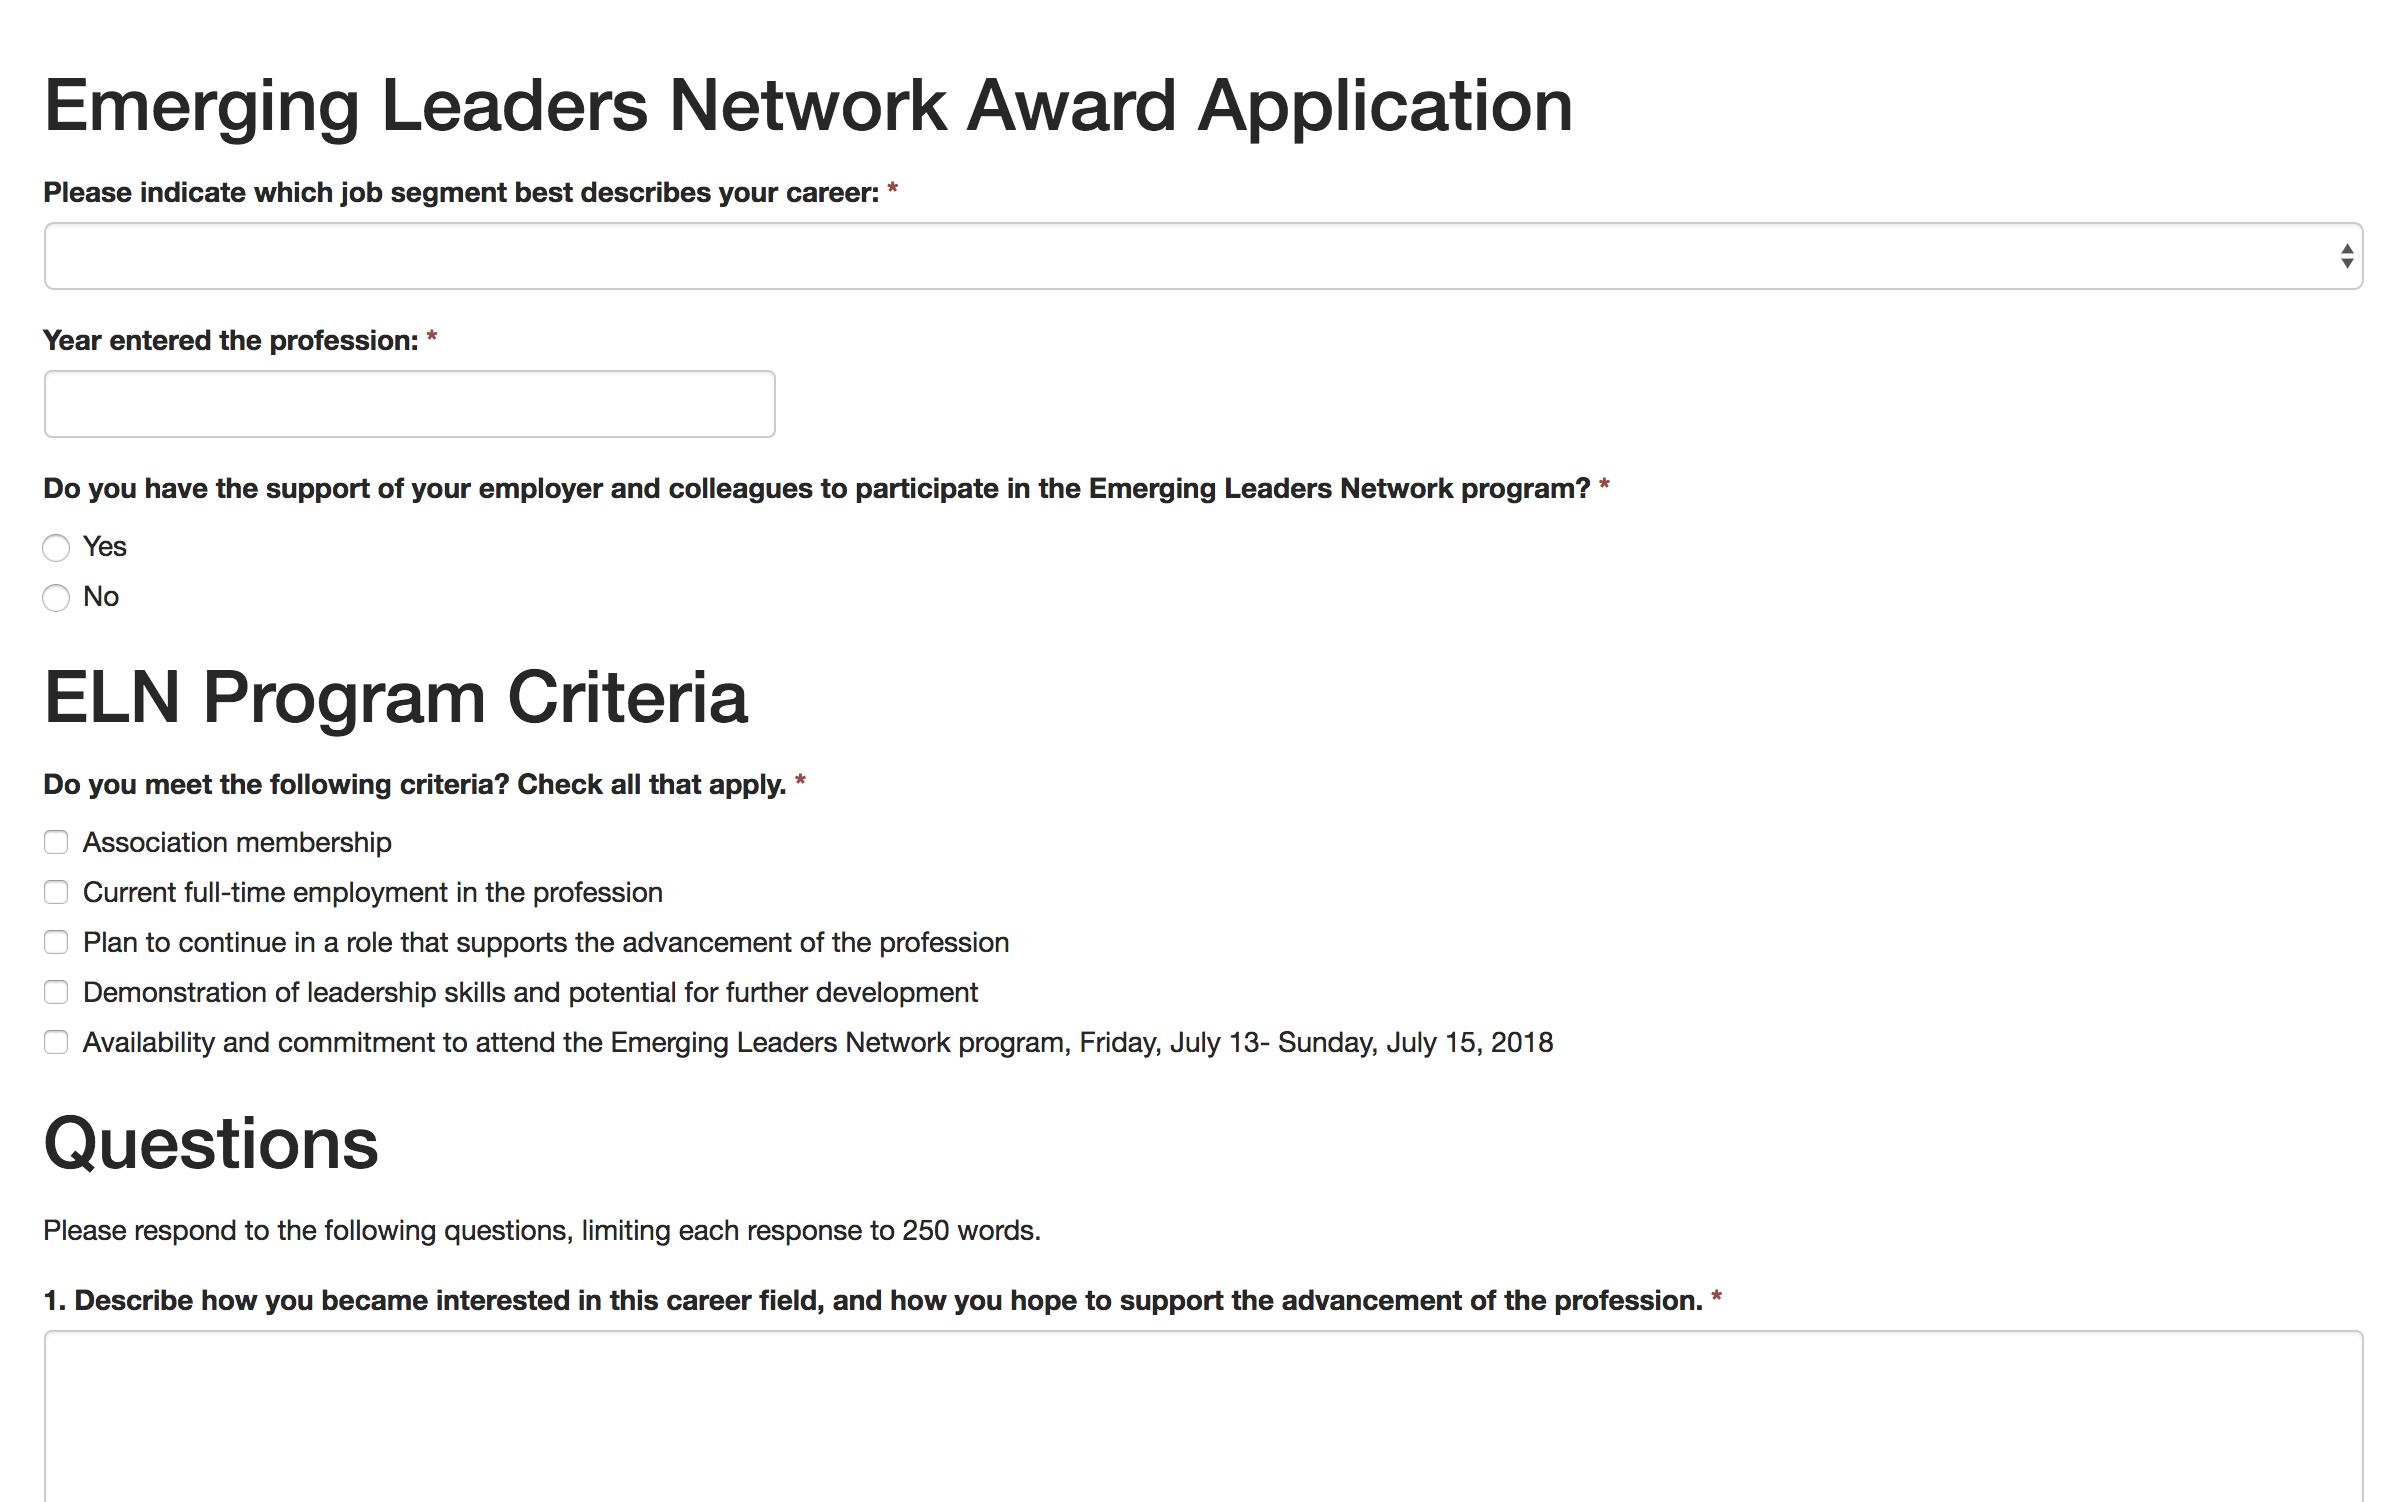 Award Application